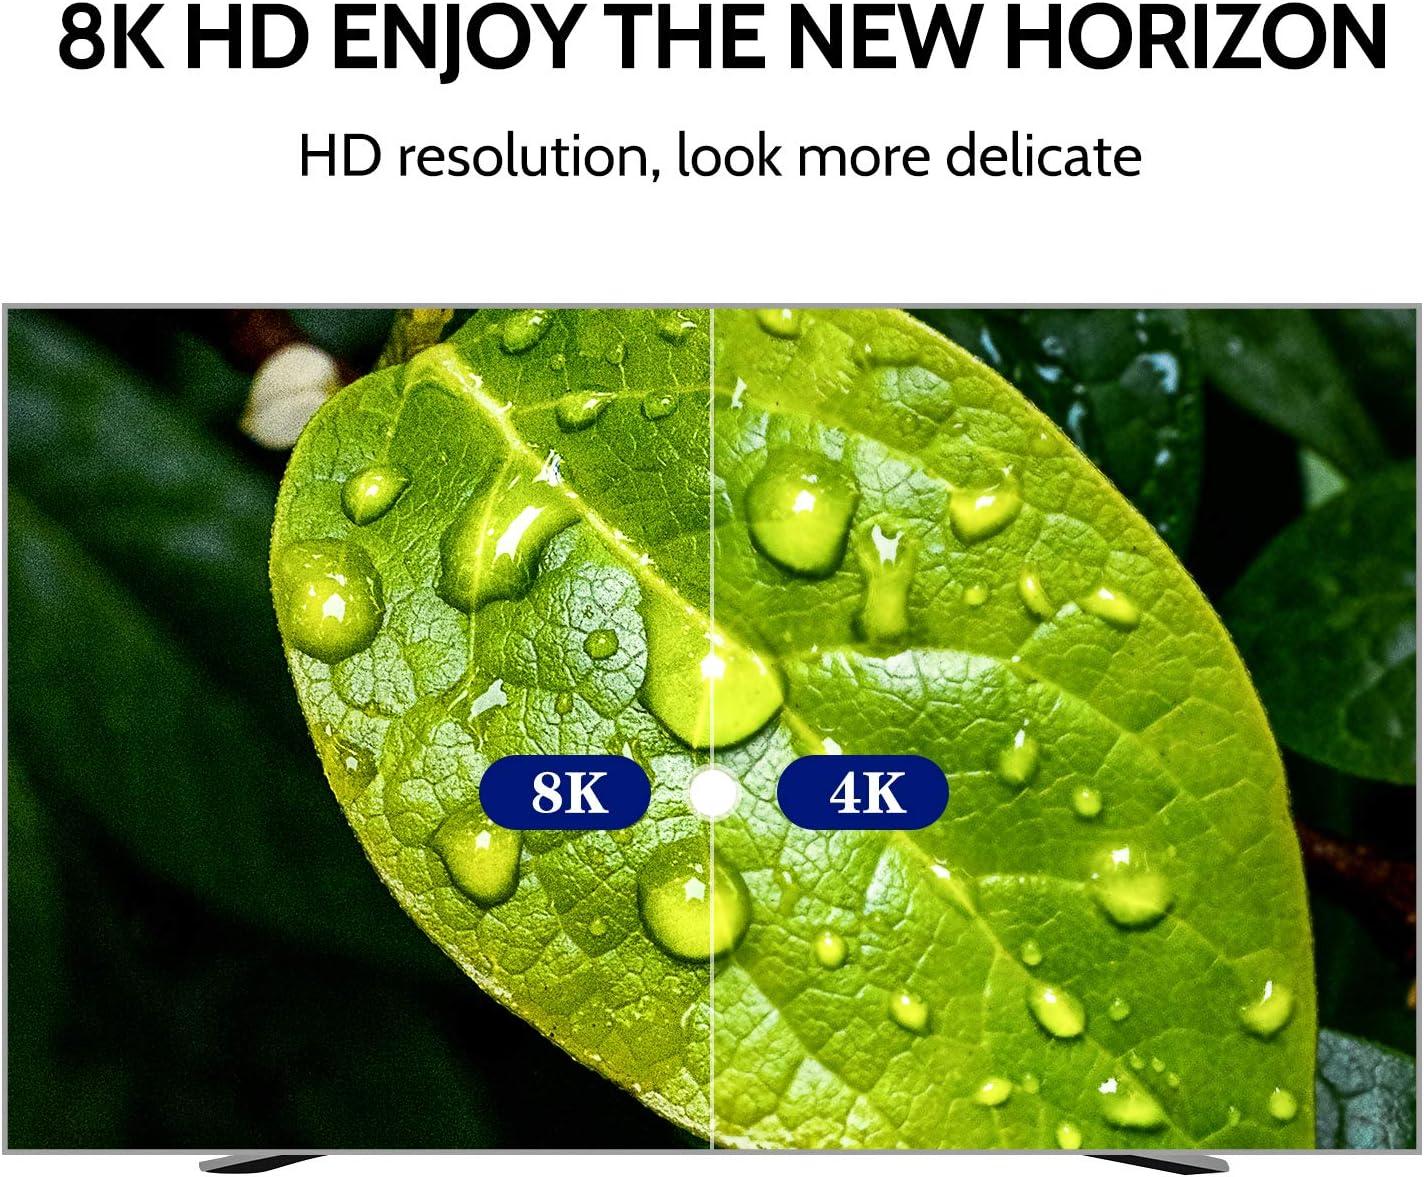 7680P Dolby Vision Hochgeschwindigkeits-48-Gbit//s-8K bei 60 Hz HDCP 2.2 4: 4: 4-HDR eARC AUDIANO 8K HDMI 2.1-Kabel 8K 8K HDMI-Kabel